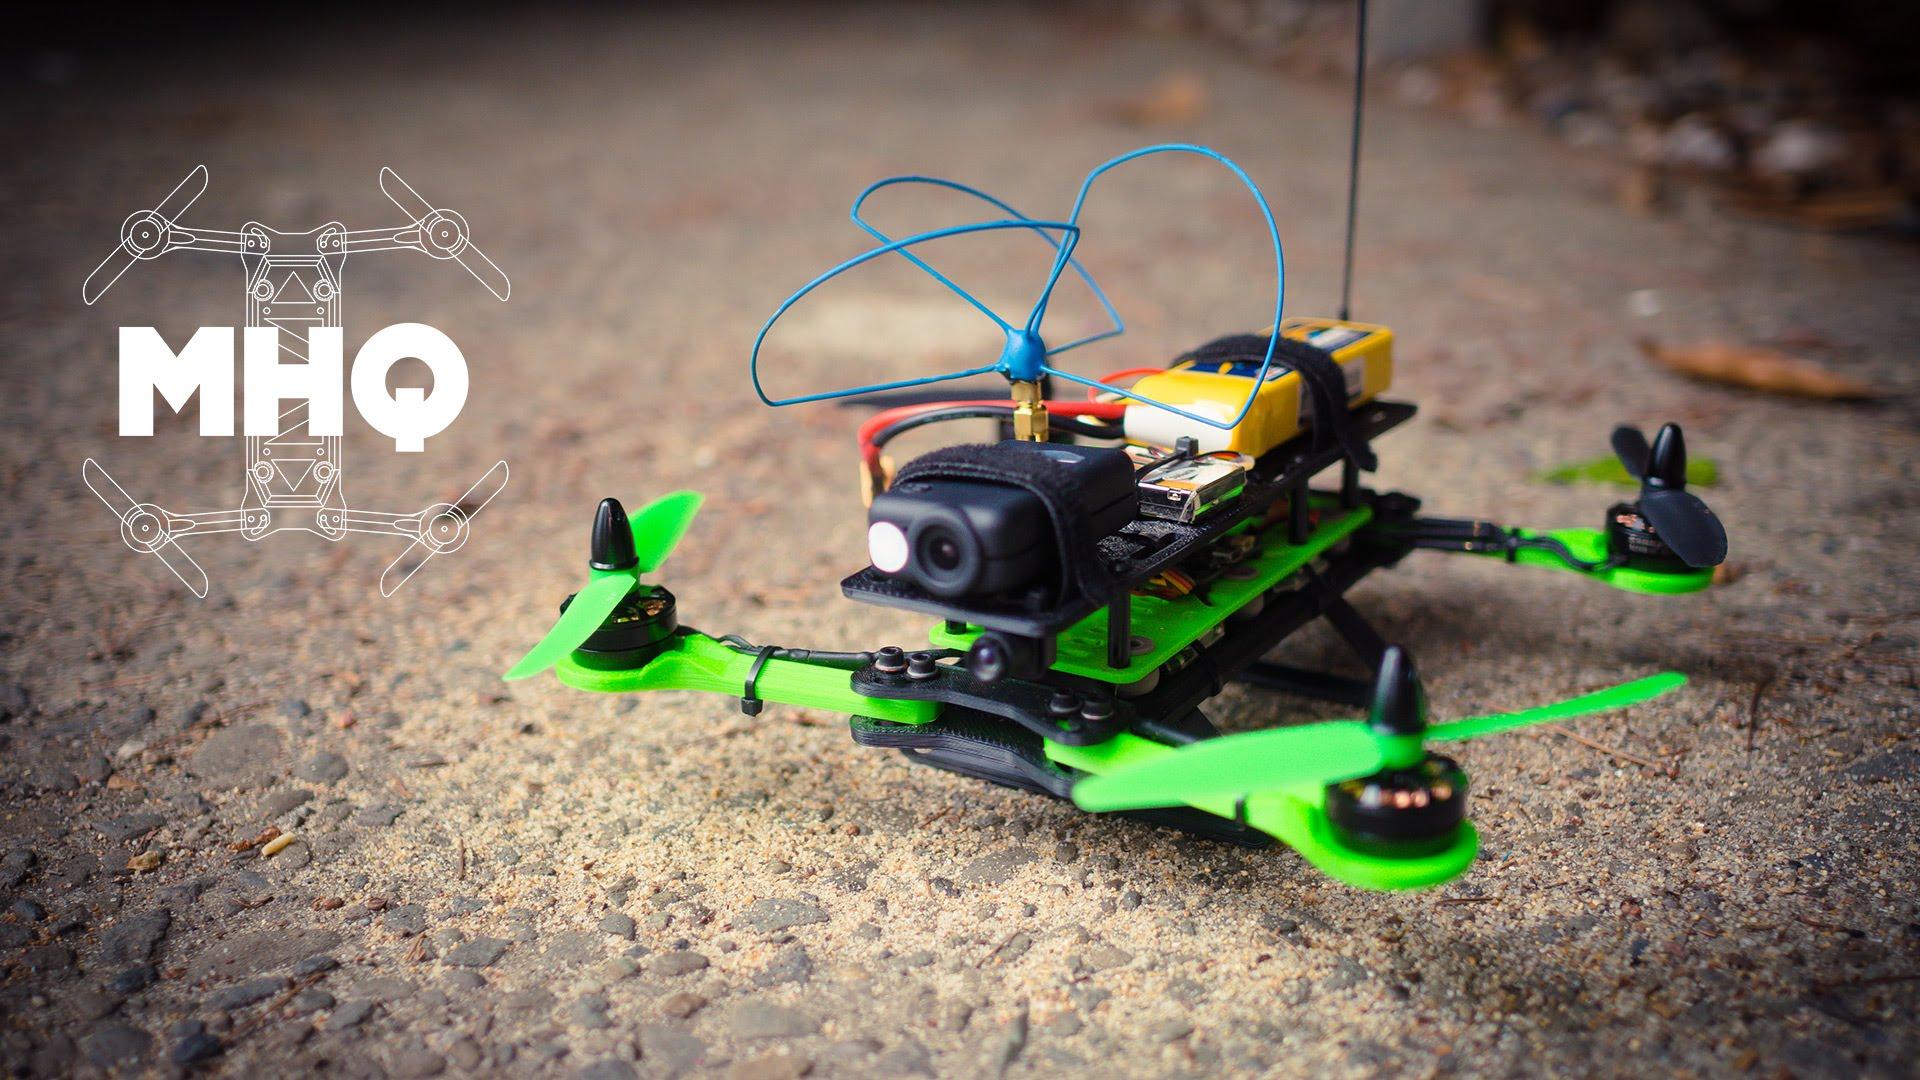 3D Printed MHQ2 Hovership